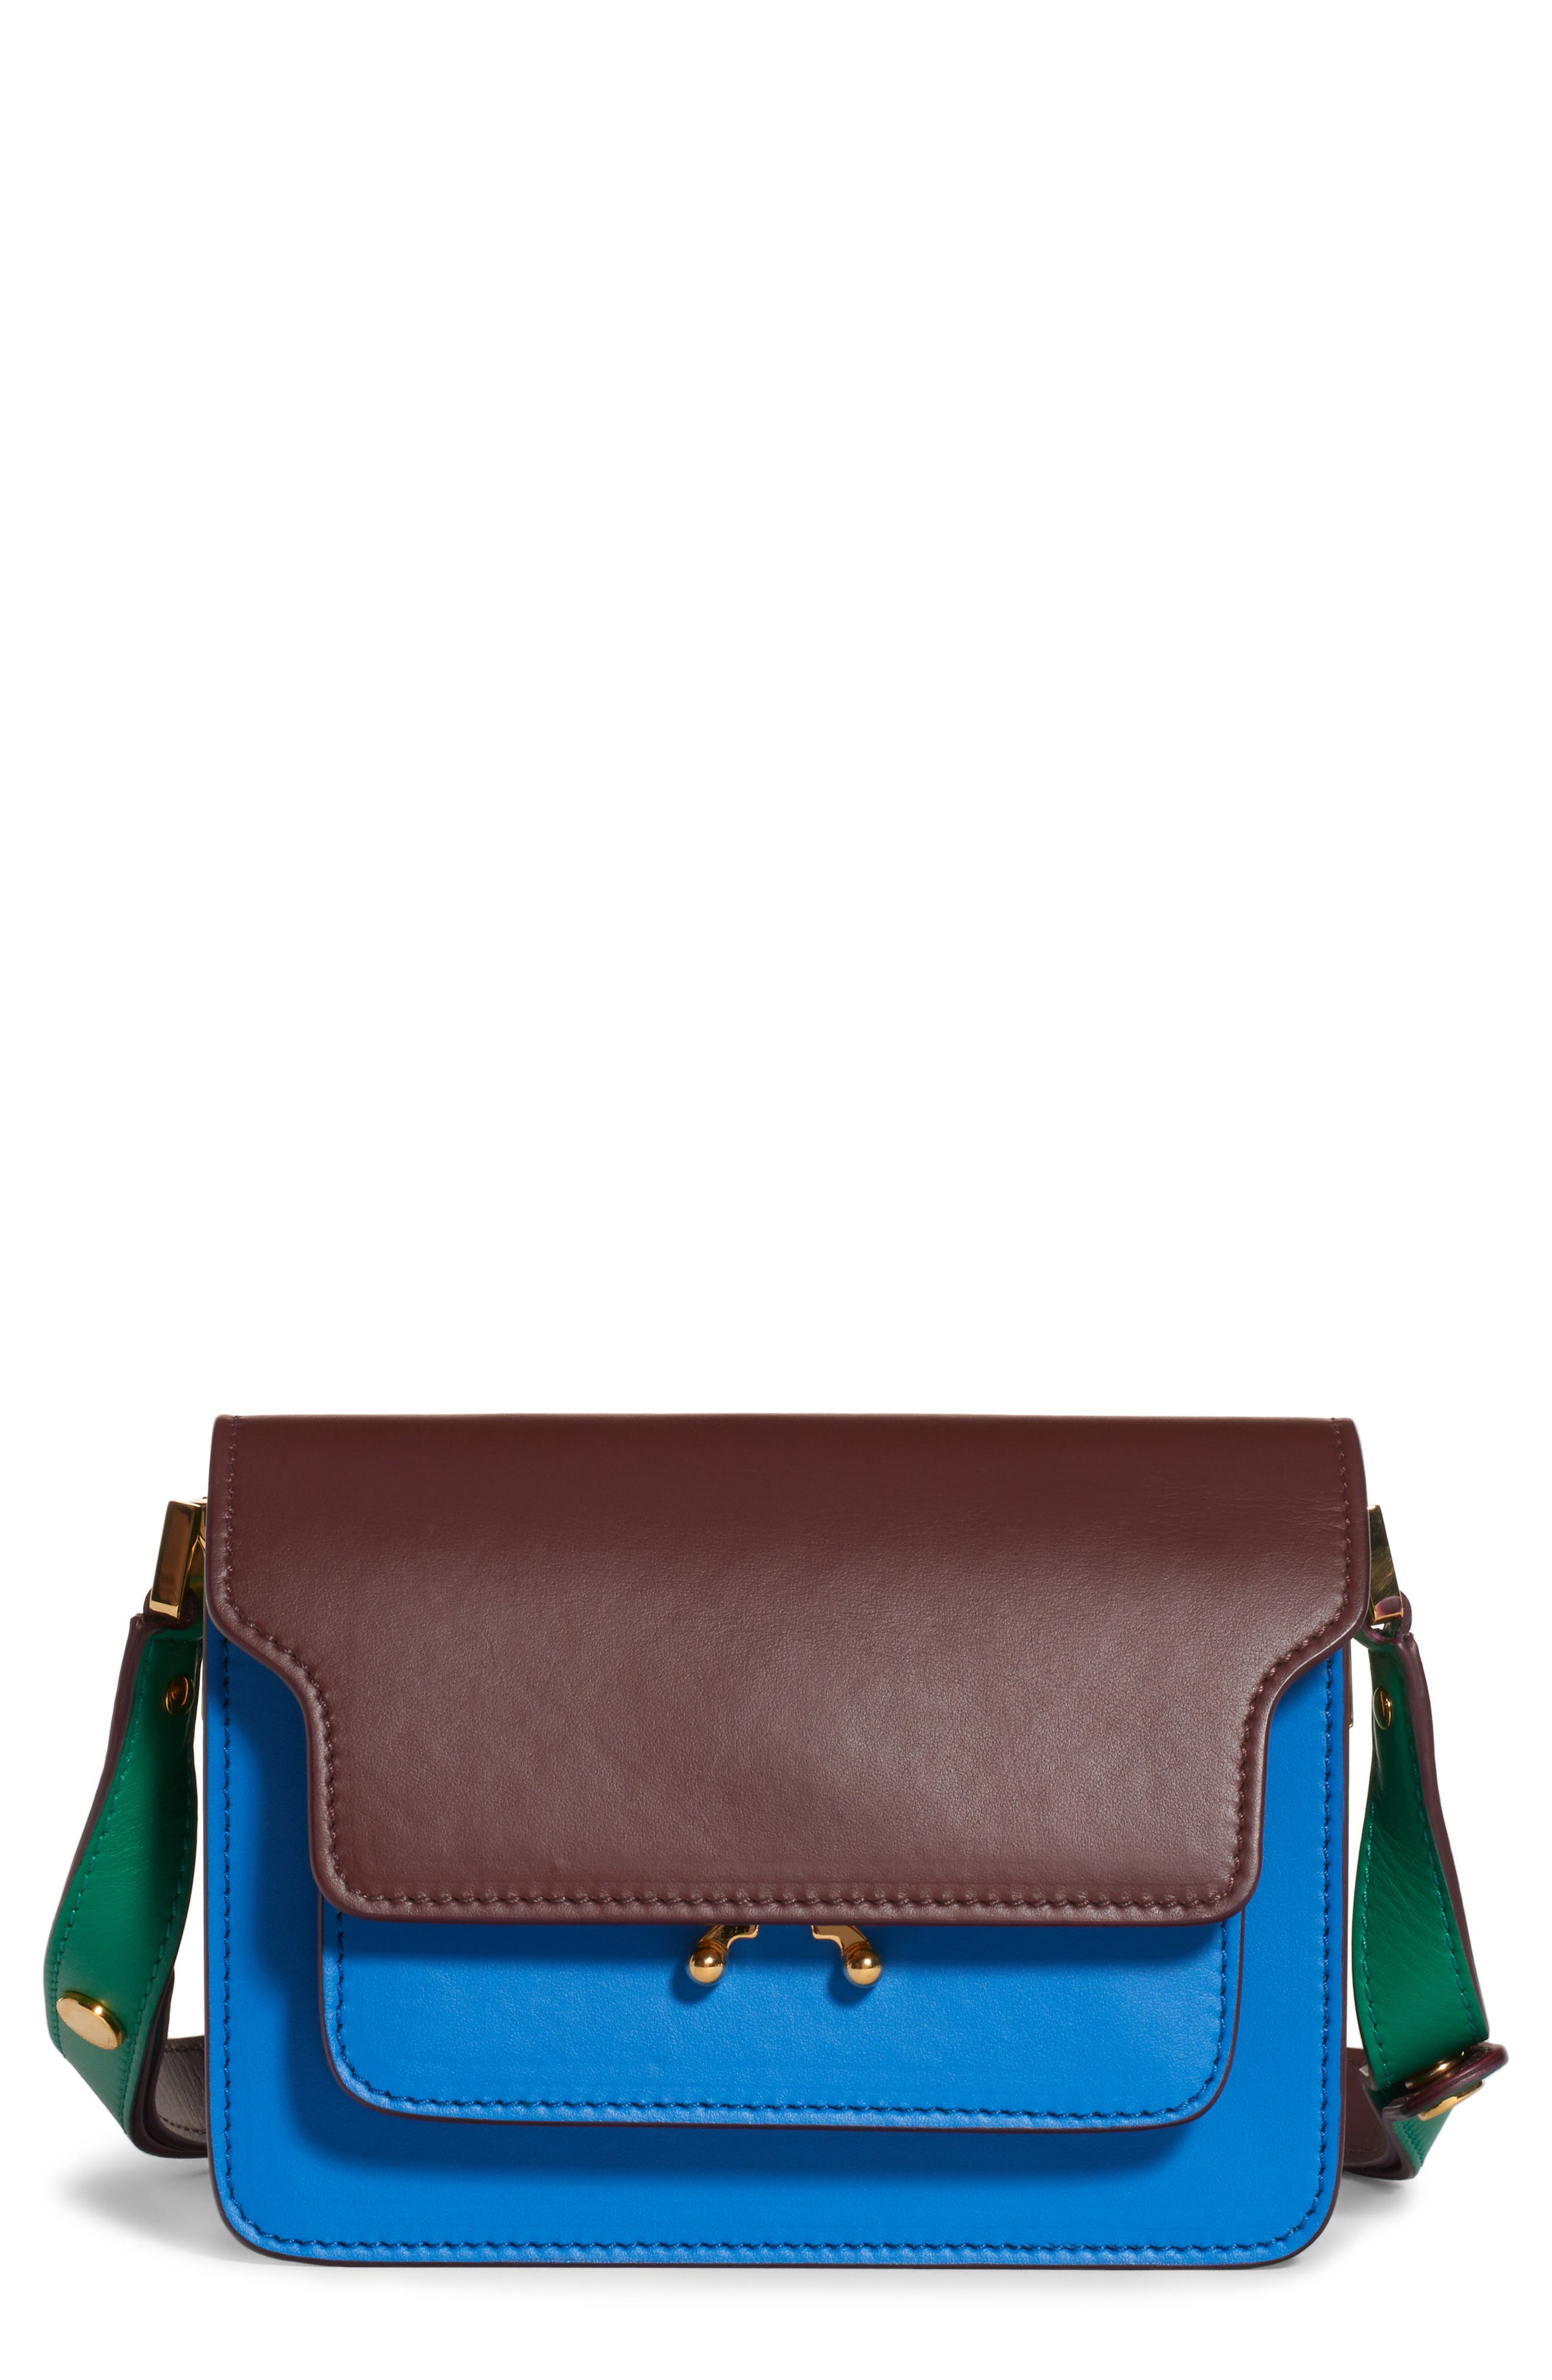 aebdf307d029 marni handbags for women